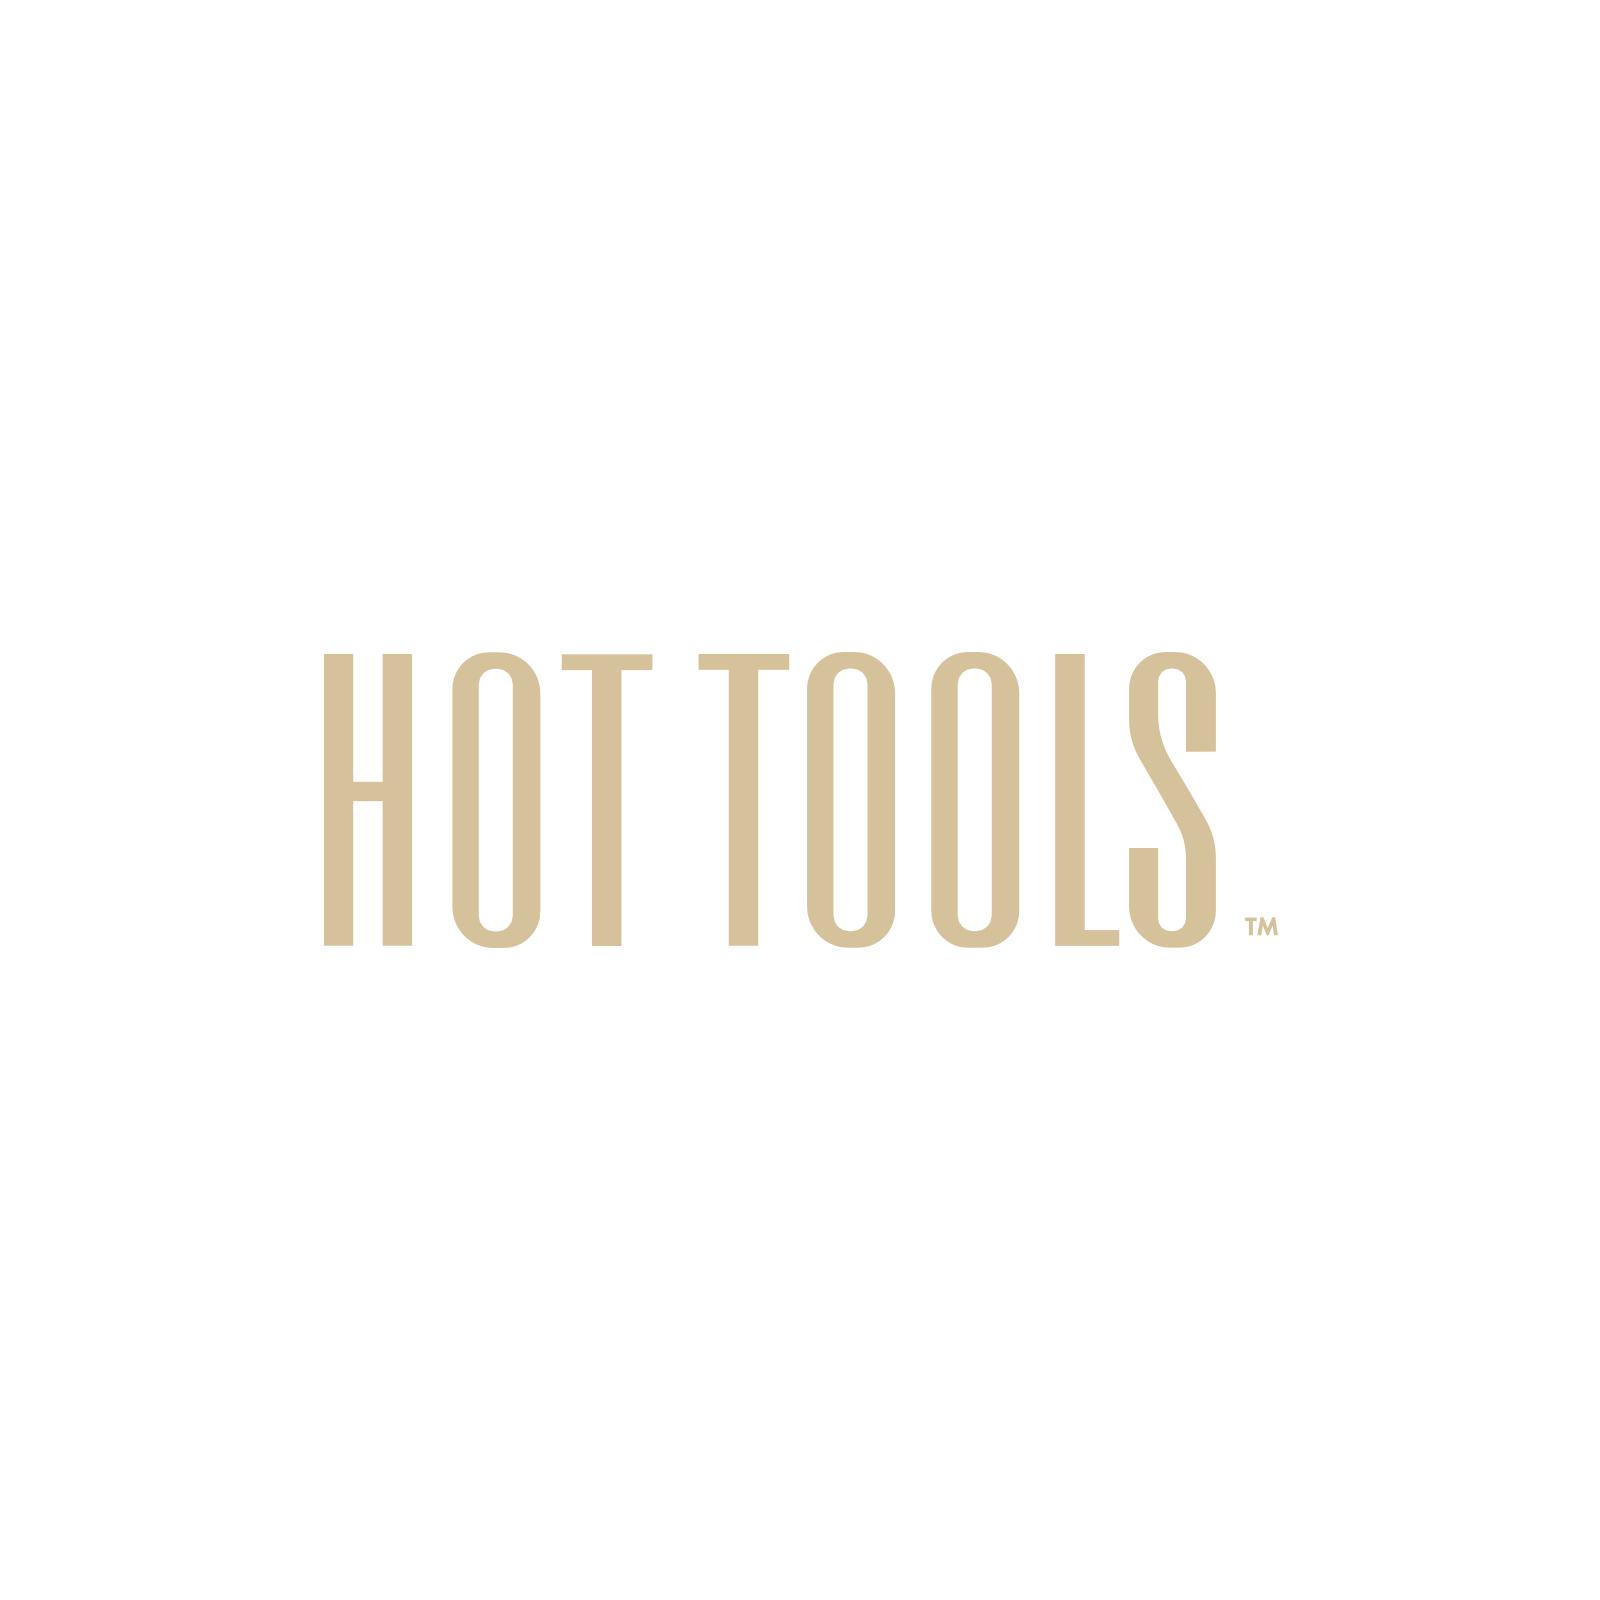 Hot Tools® Signature Series Salon Turbo Ionic® Dryer, 1875 watts product image